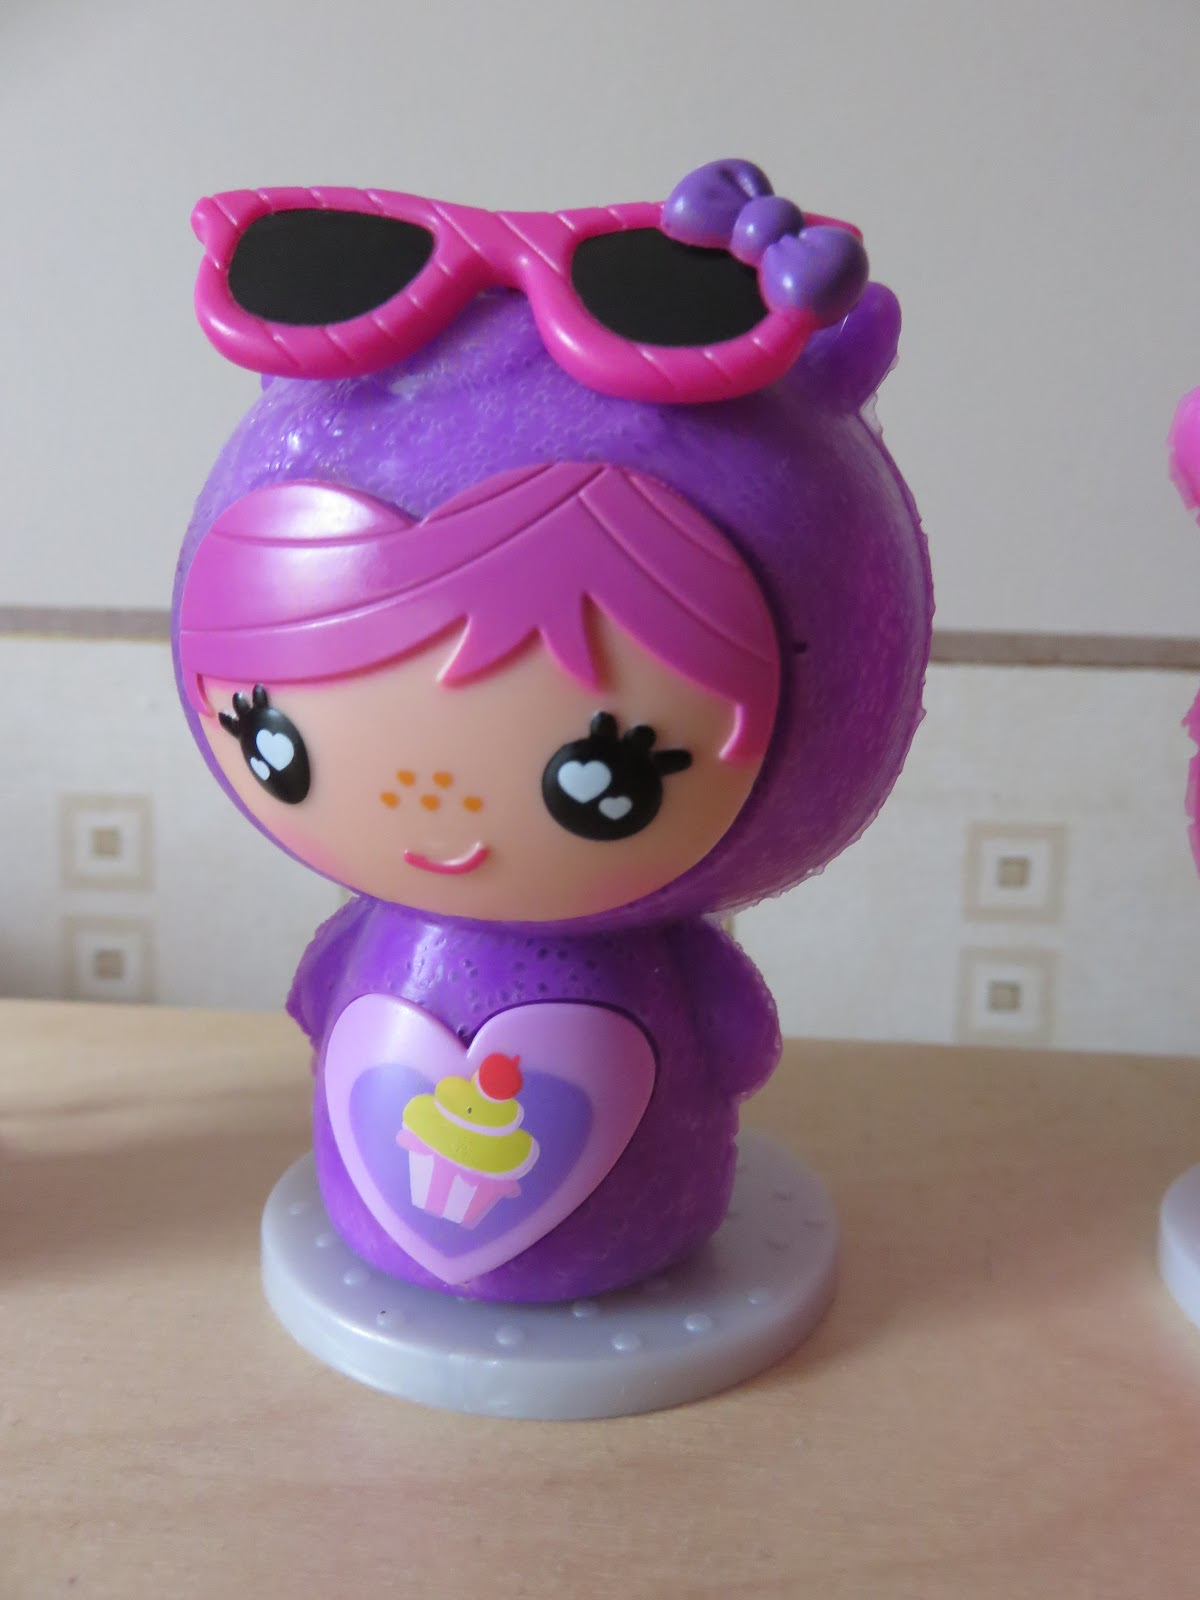 New Purple Smooshins Surprise Character Kit